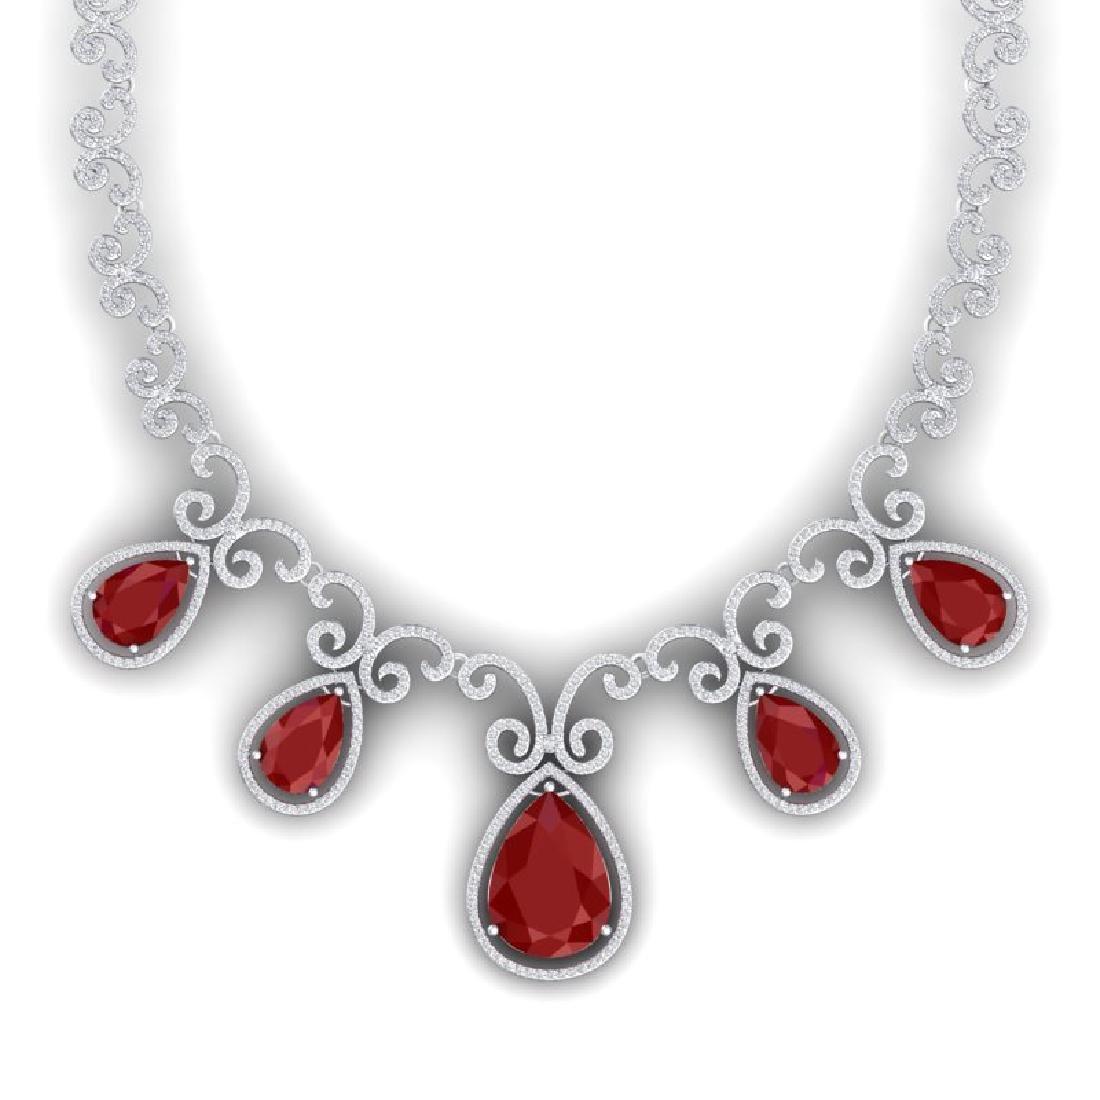 38.42 CTW Royalty Ruby & VS Diamond Necklace 18K White